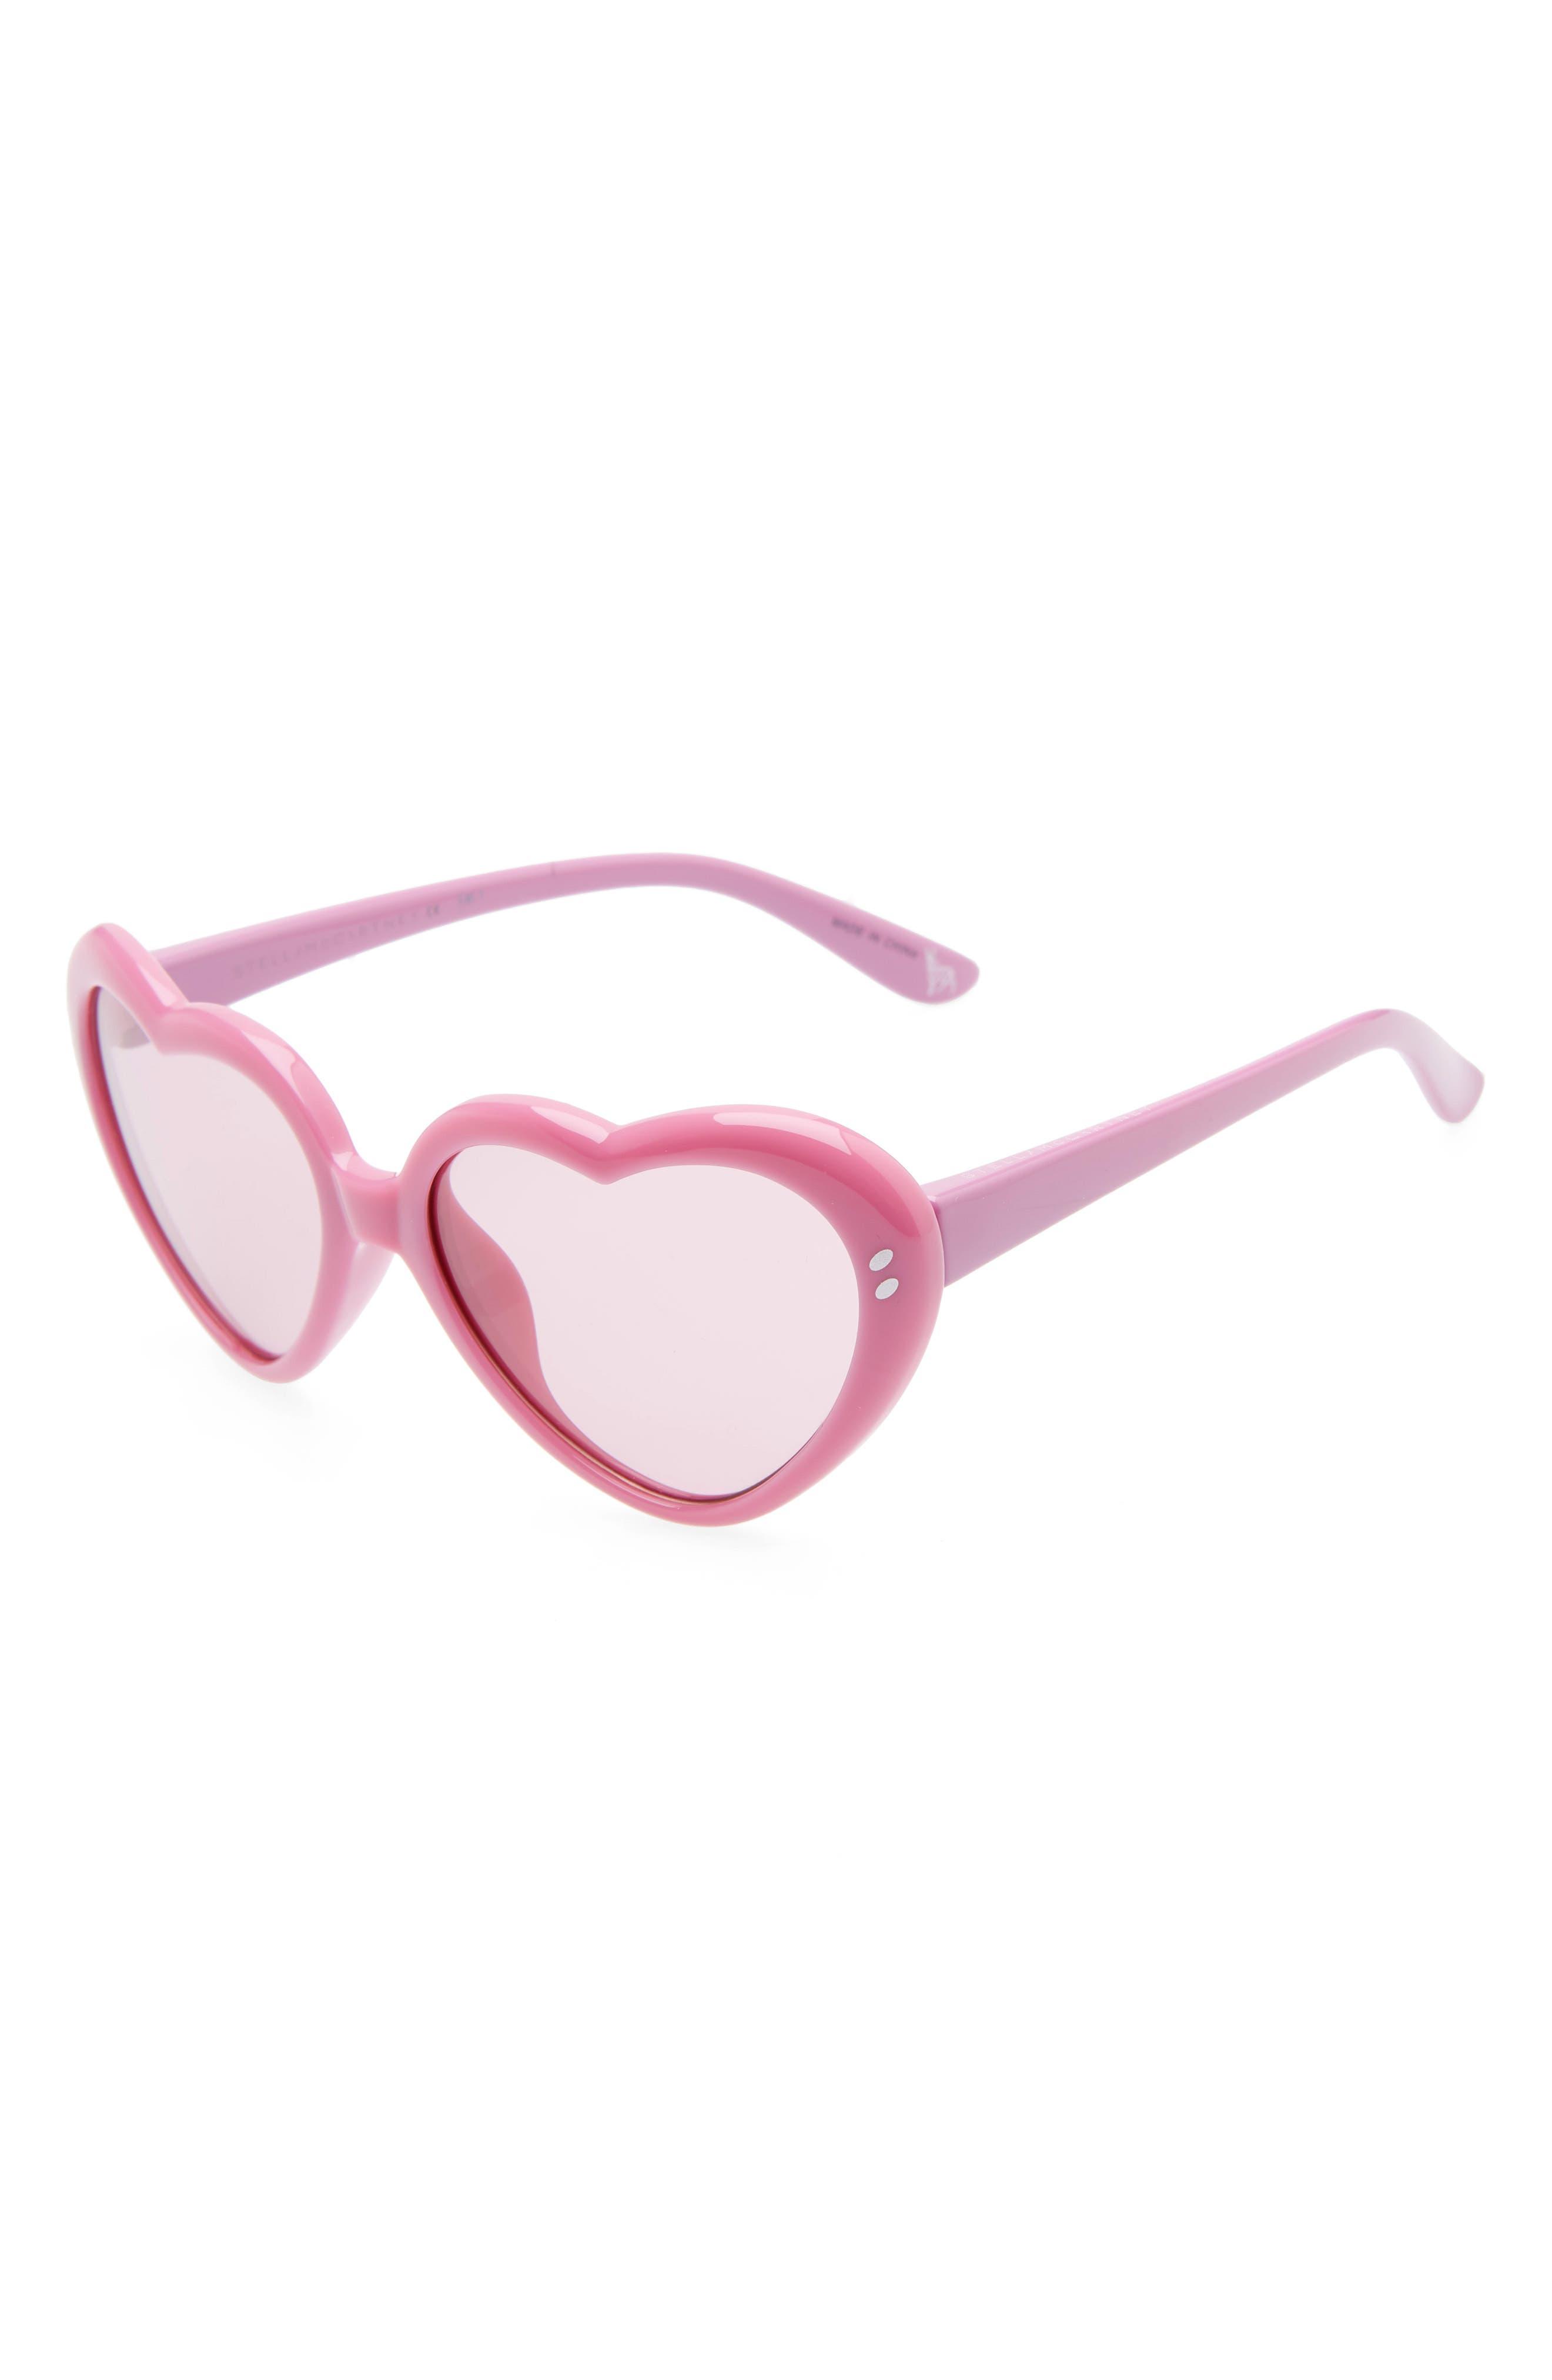 STELLA MCCARTNEY KIDS 49mm Heart Sunglasses, Main, color, 514